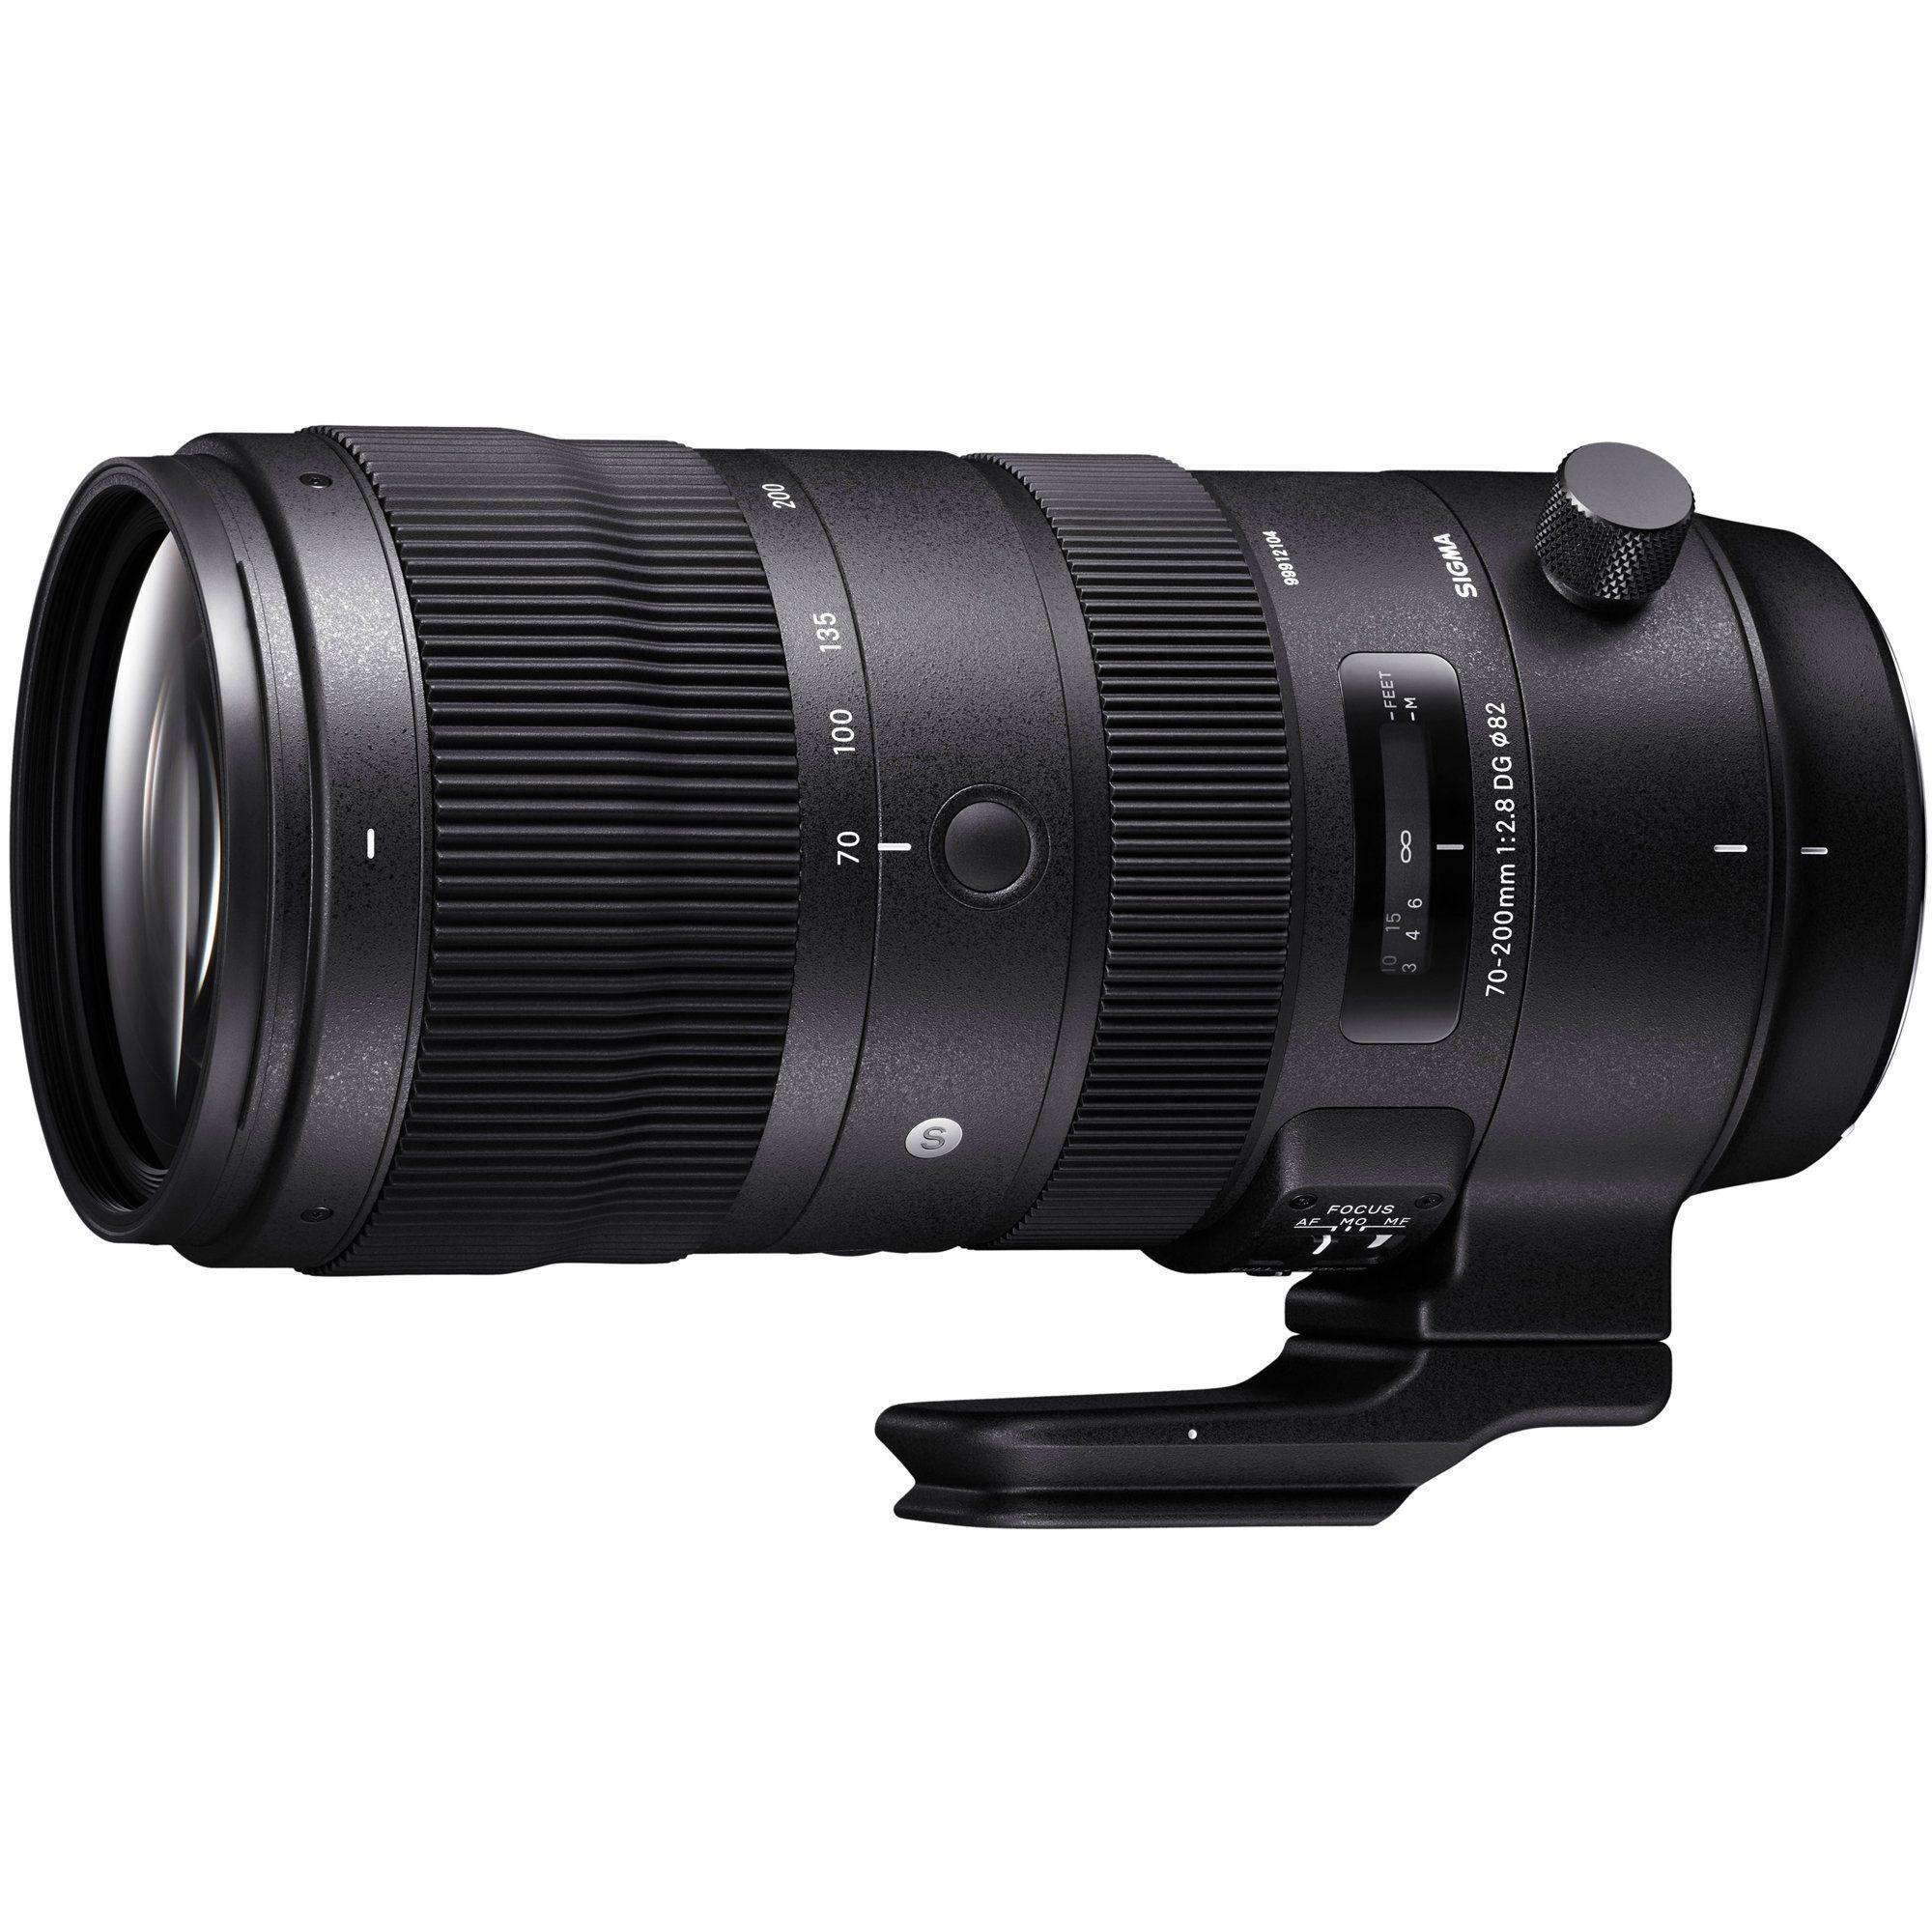 Sigma 70 200mm F2 8 Dg Os Hsm Sports Full Frame Lens Canon Ef Mount Usb Dock Bundle In 2021 Sigma Lenses Telephoto Zoom Lens Canon Lens